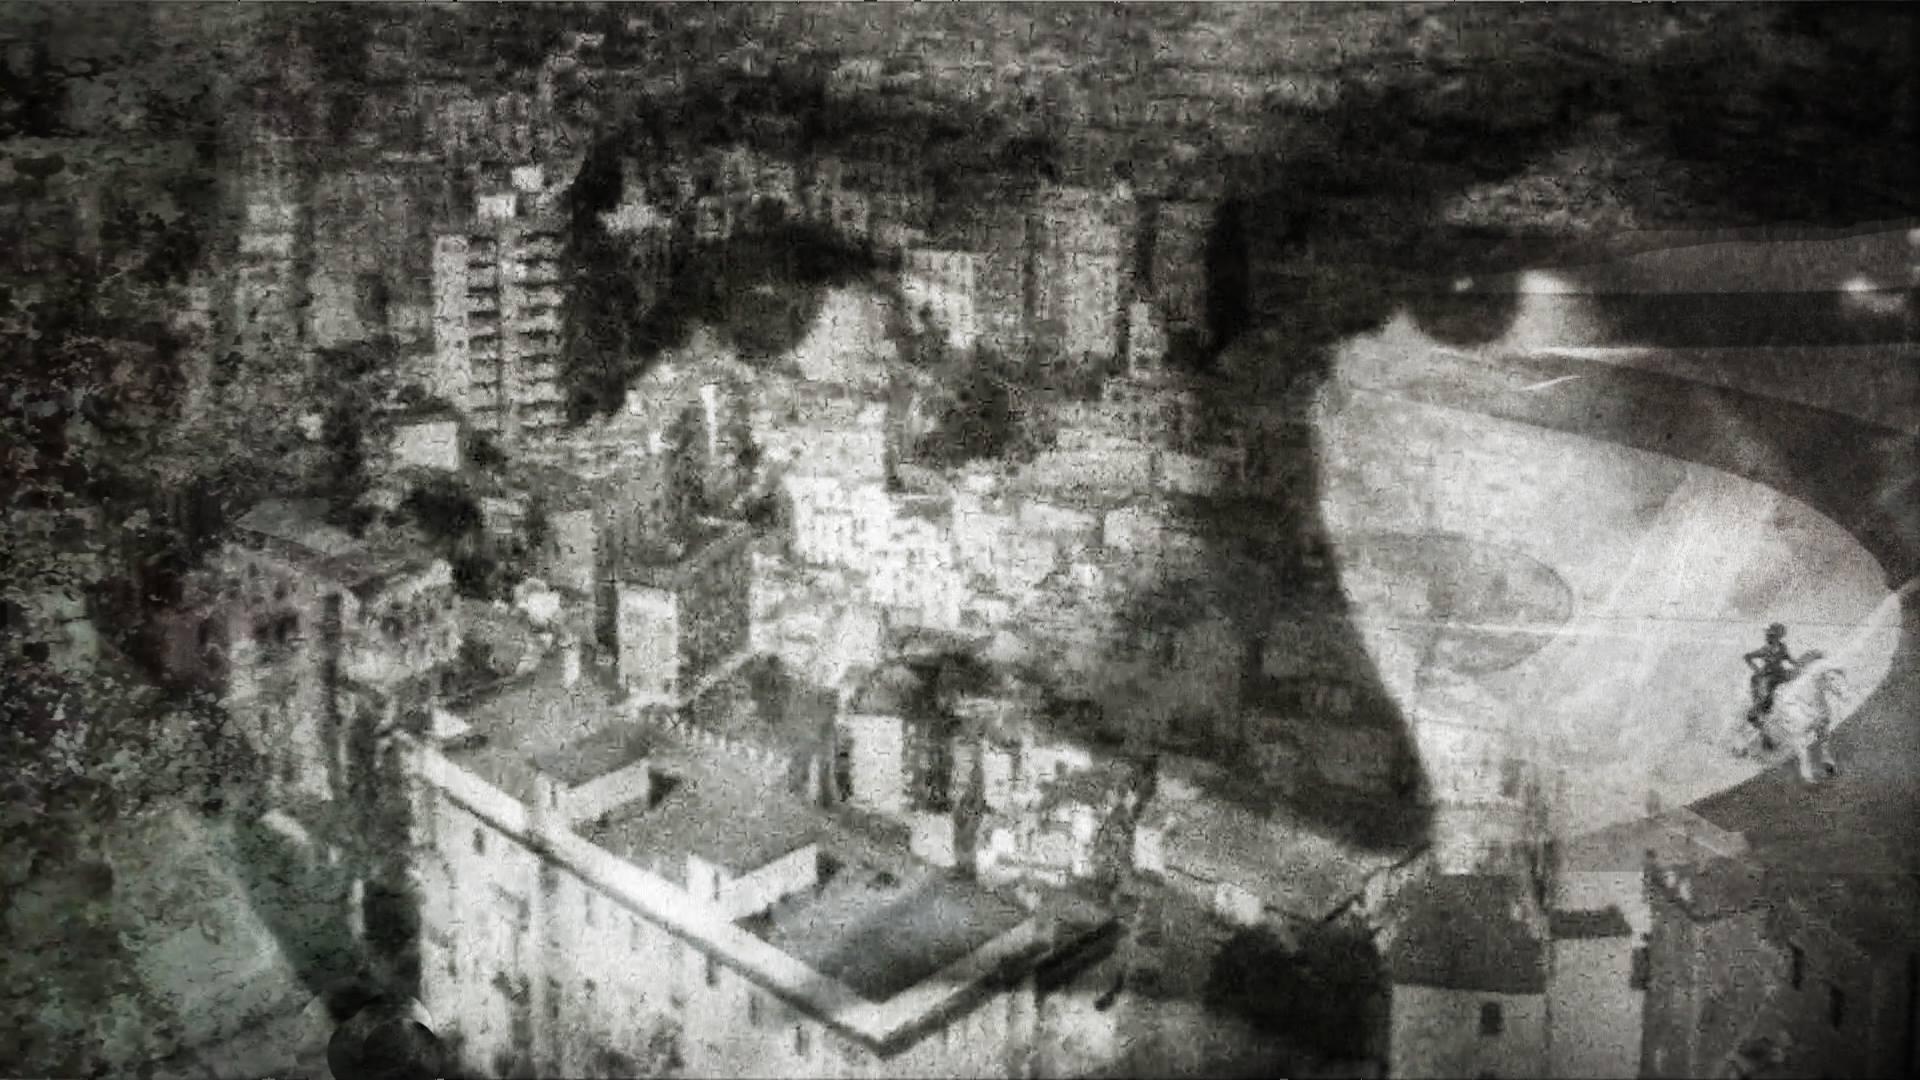 Napoli film by Seppo Renvall